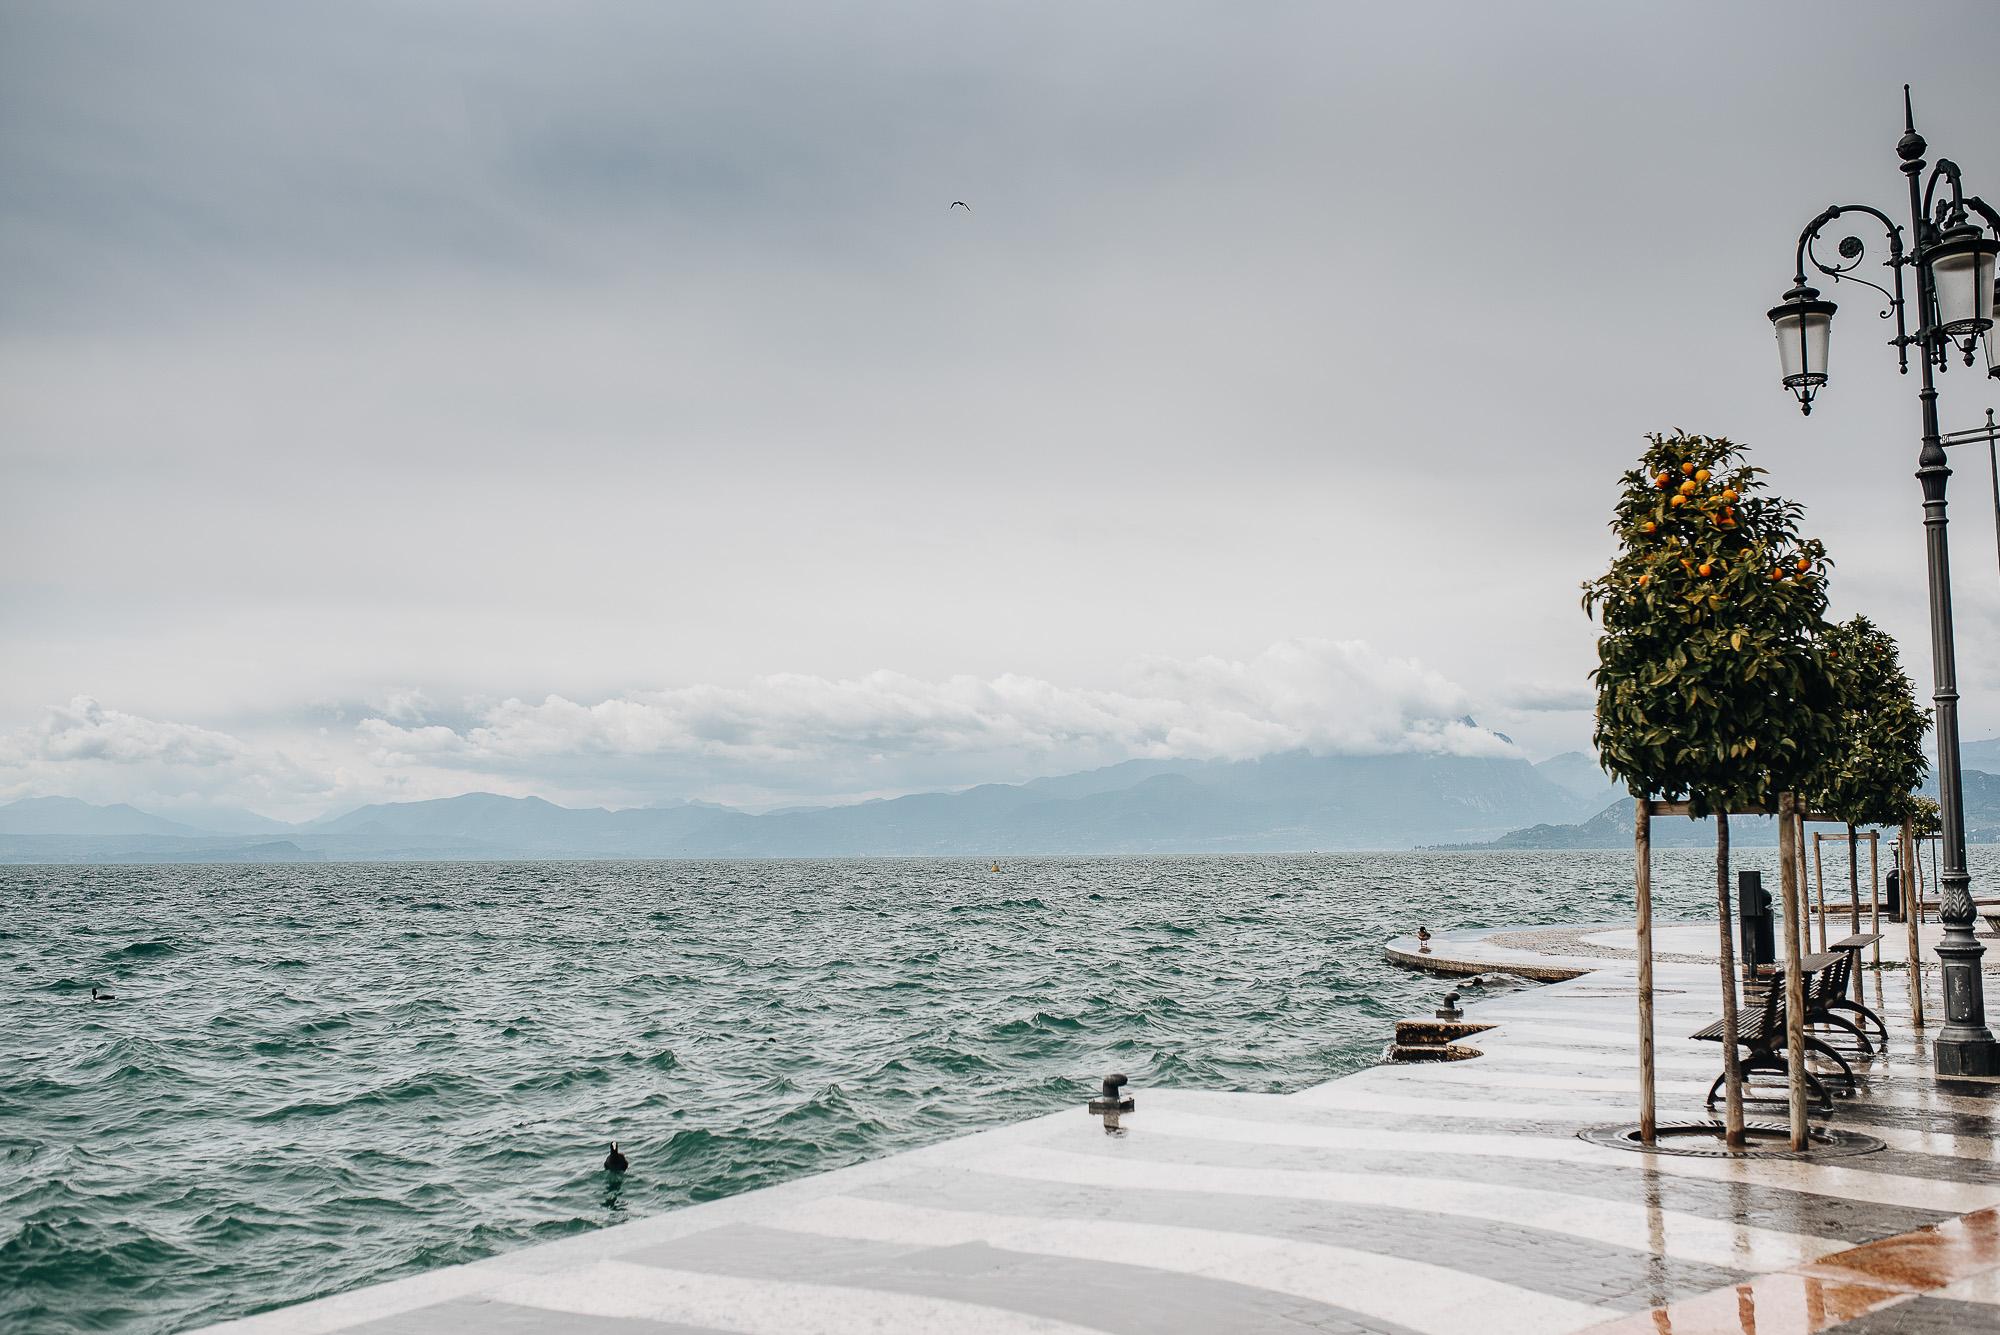 OurBeautifulAdventure-LakeGarda-Italy-Blog-1550.jpg